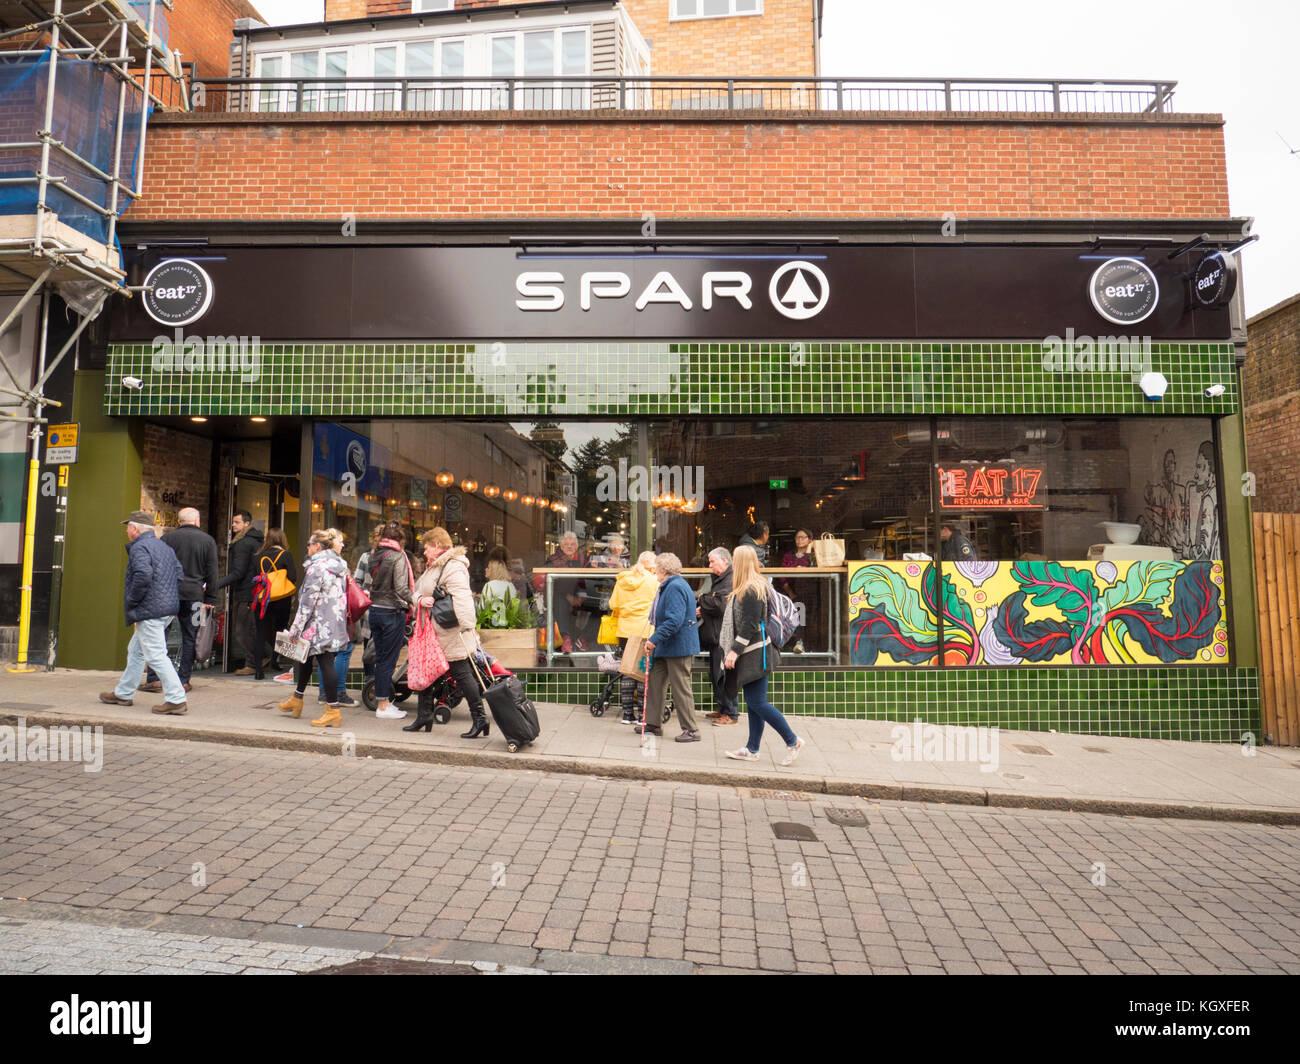 The new Eat 17 Spar and whole food shop and restaurant Bishop's Stortford, Hertfordshire UK Stock Photo